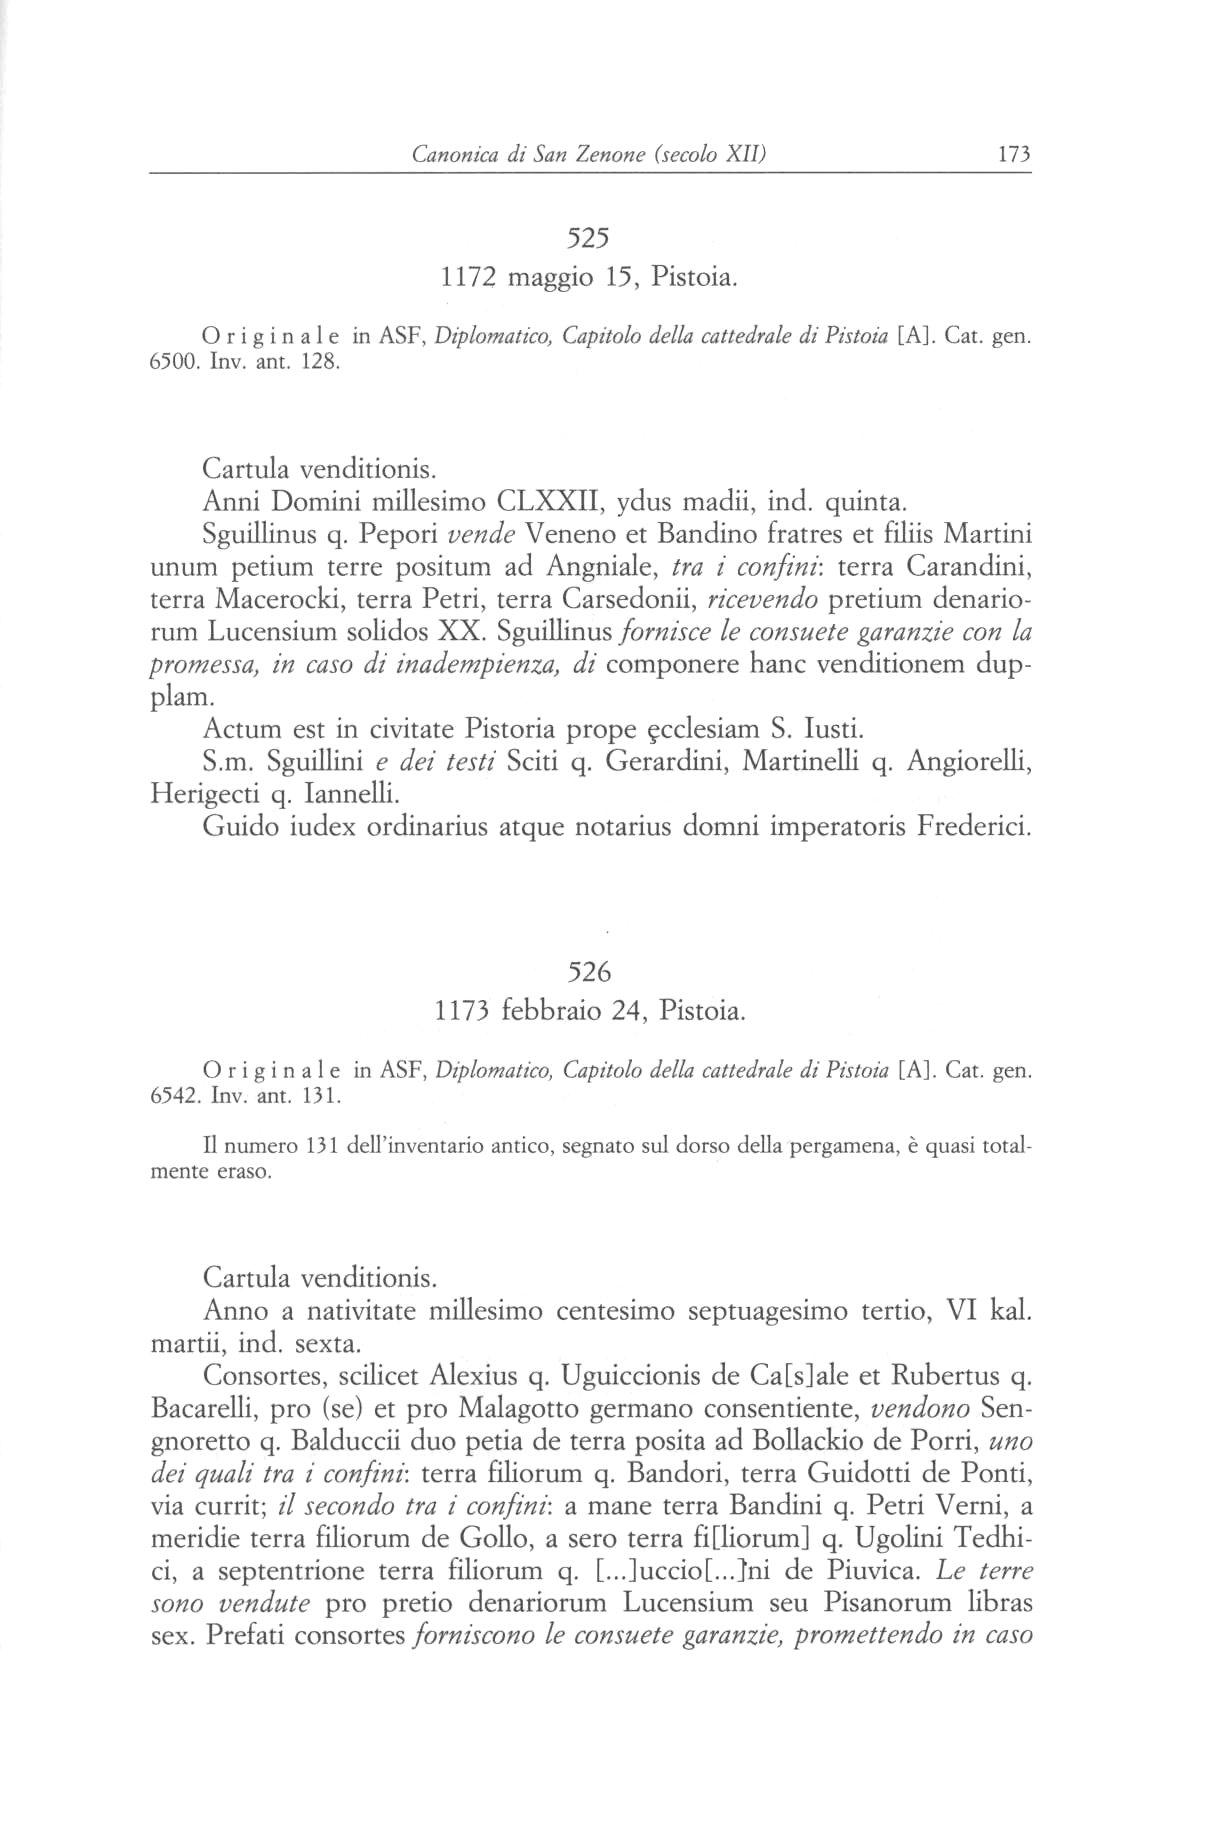 Canonica S. Zenone XII 0173.jpg